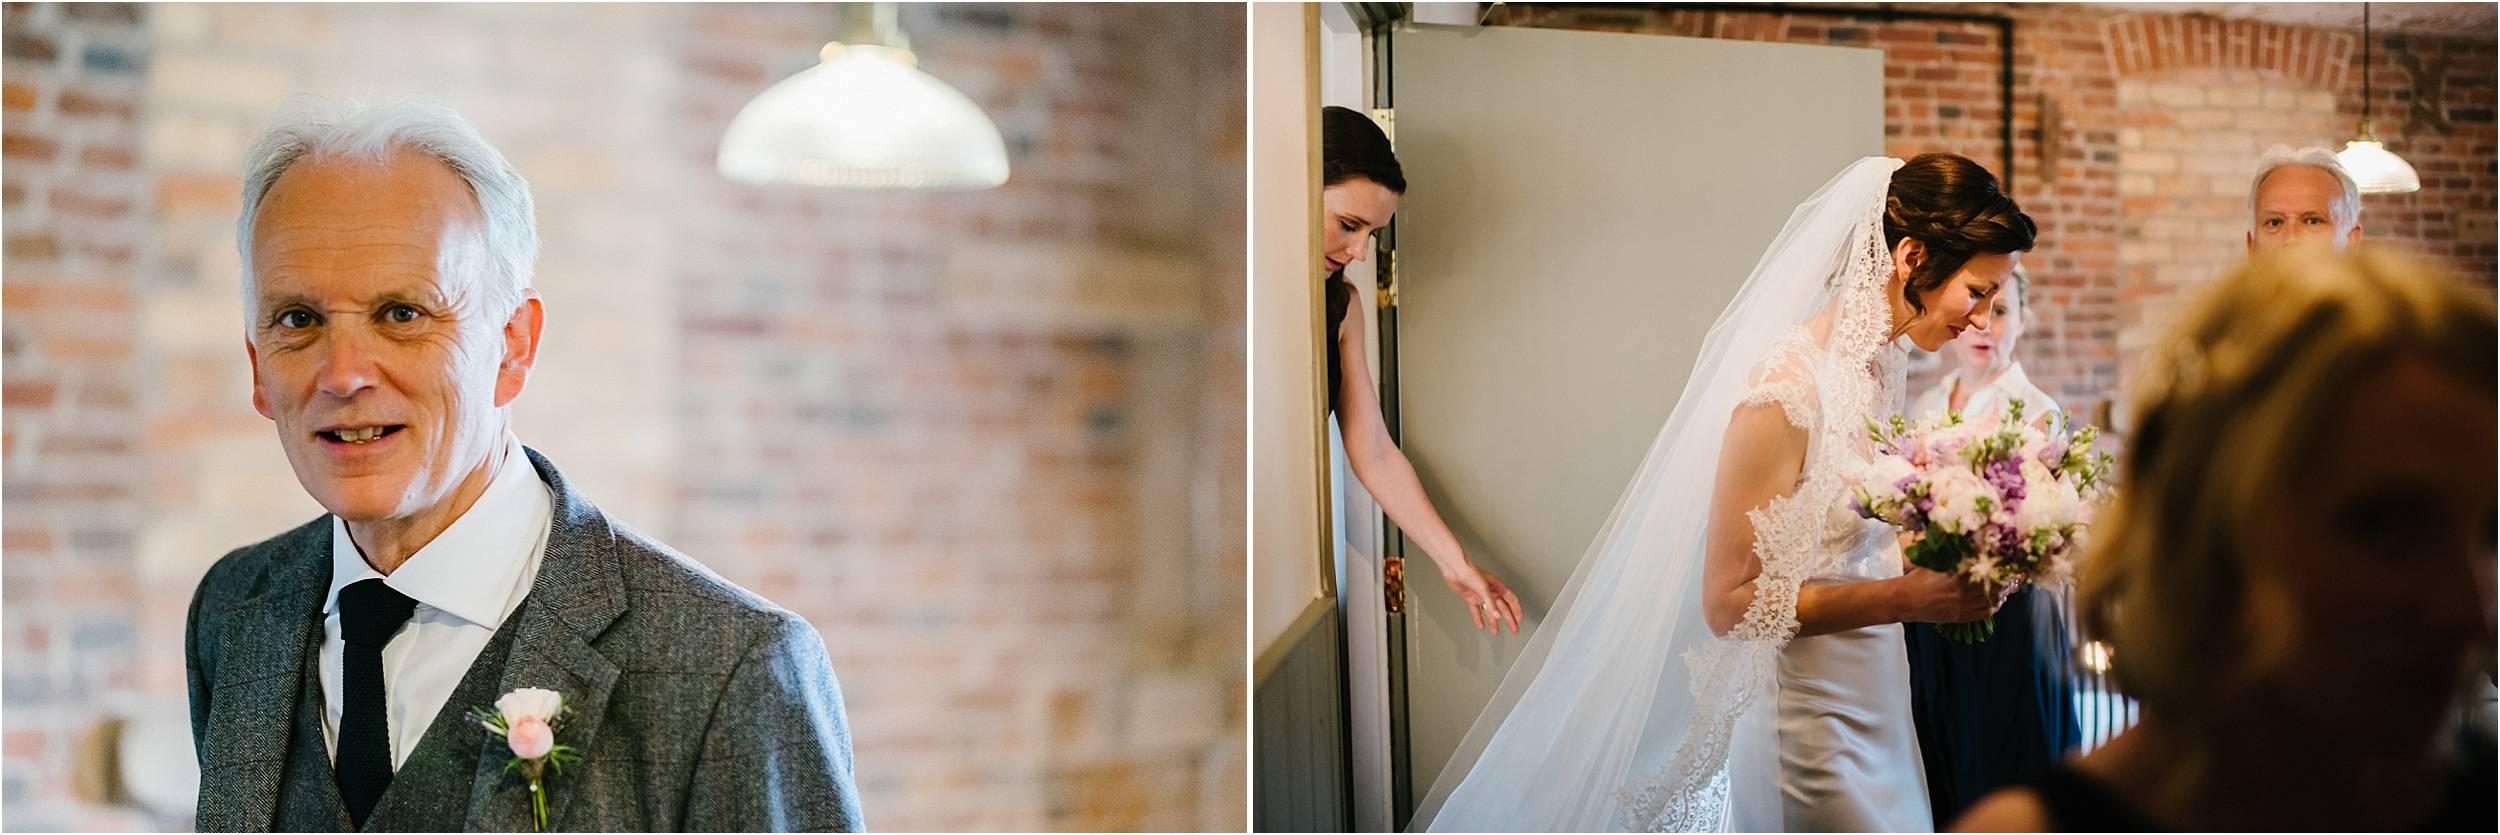 West Mill Derby Wedding Photographer_0053.jpg